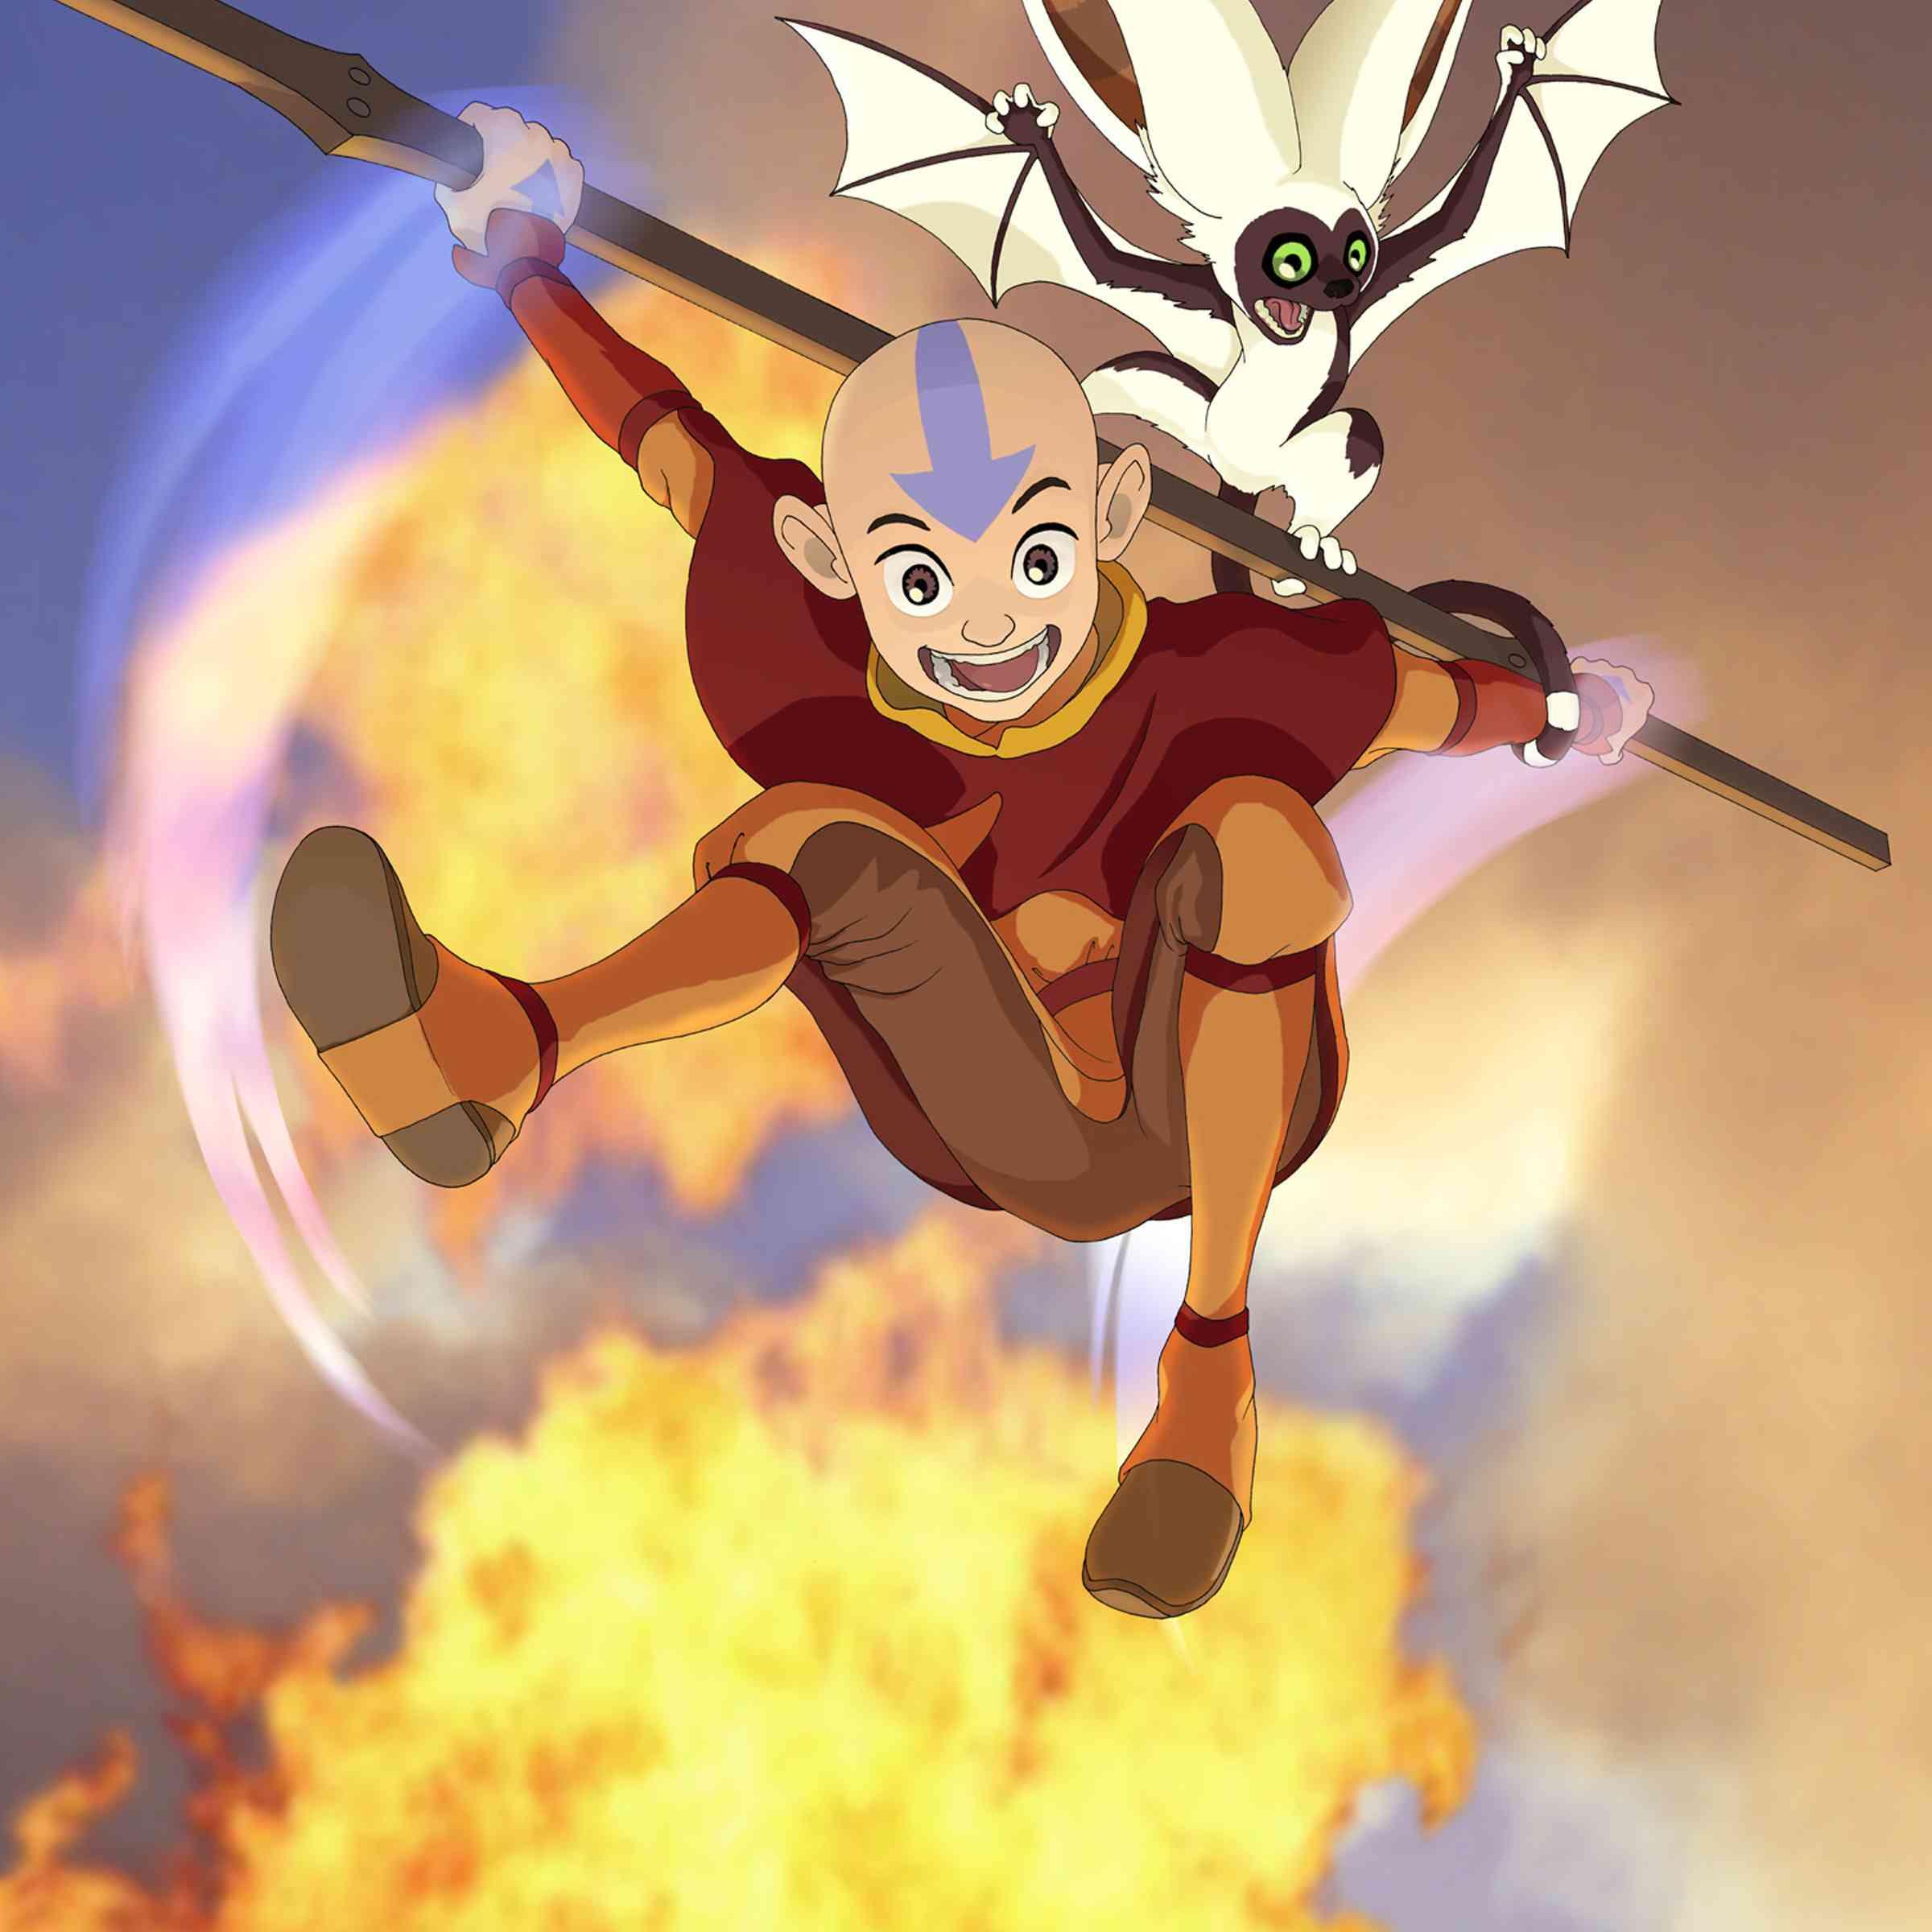 Avatar Aang: Top 'Avatar: The Last Airbender' Craziest Villains